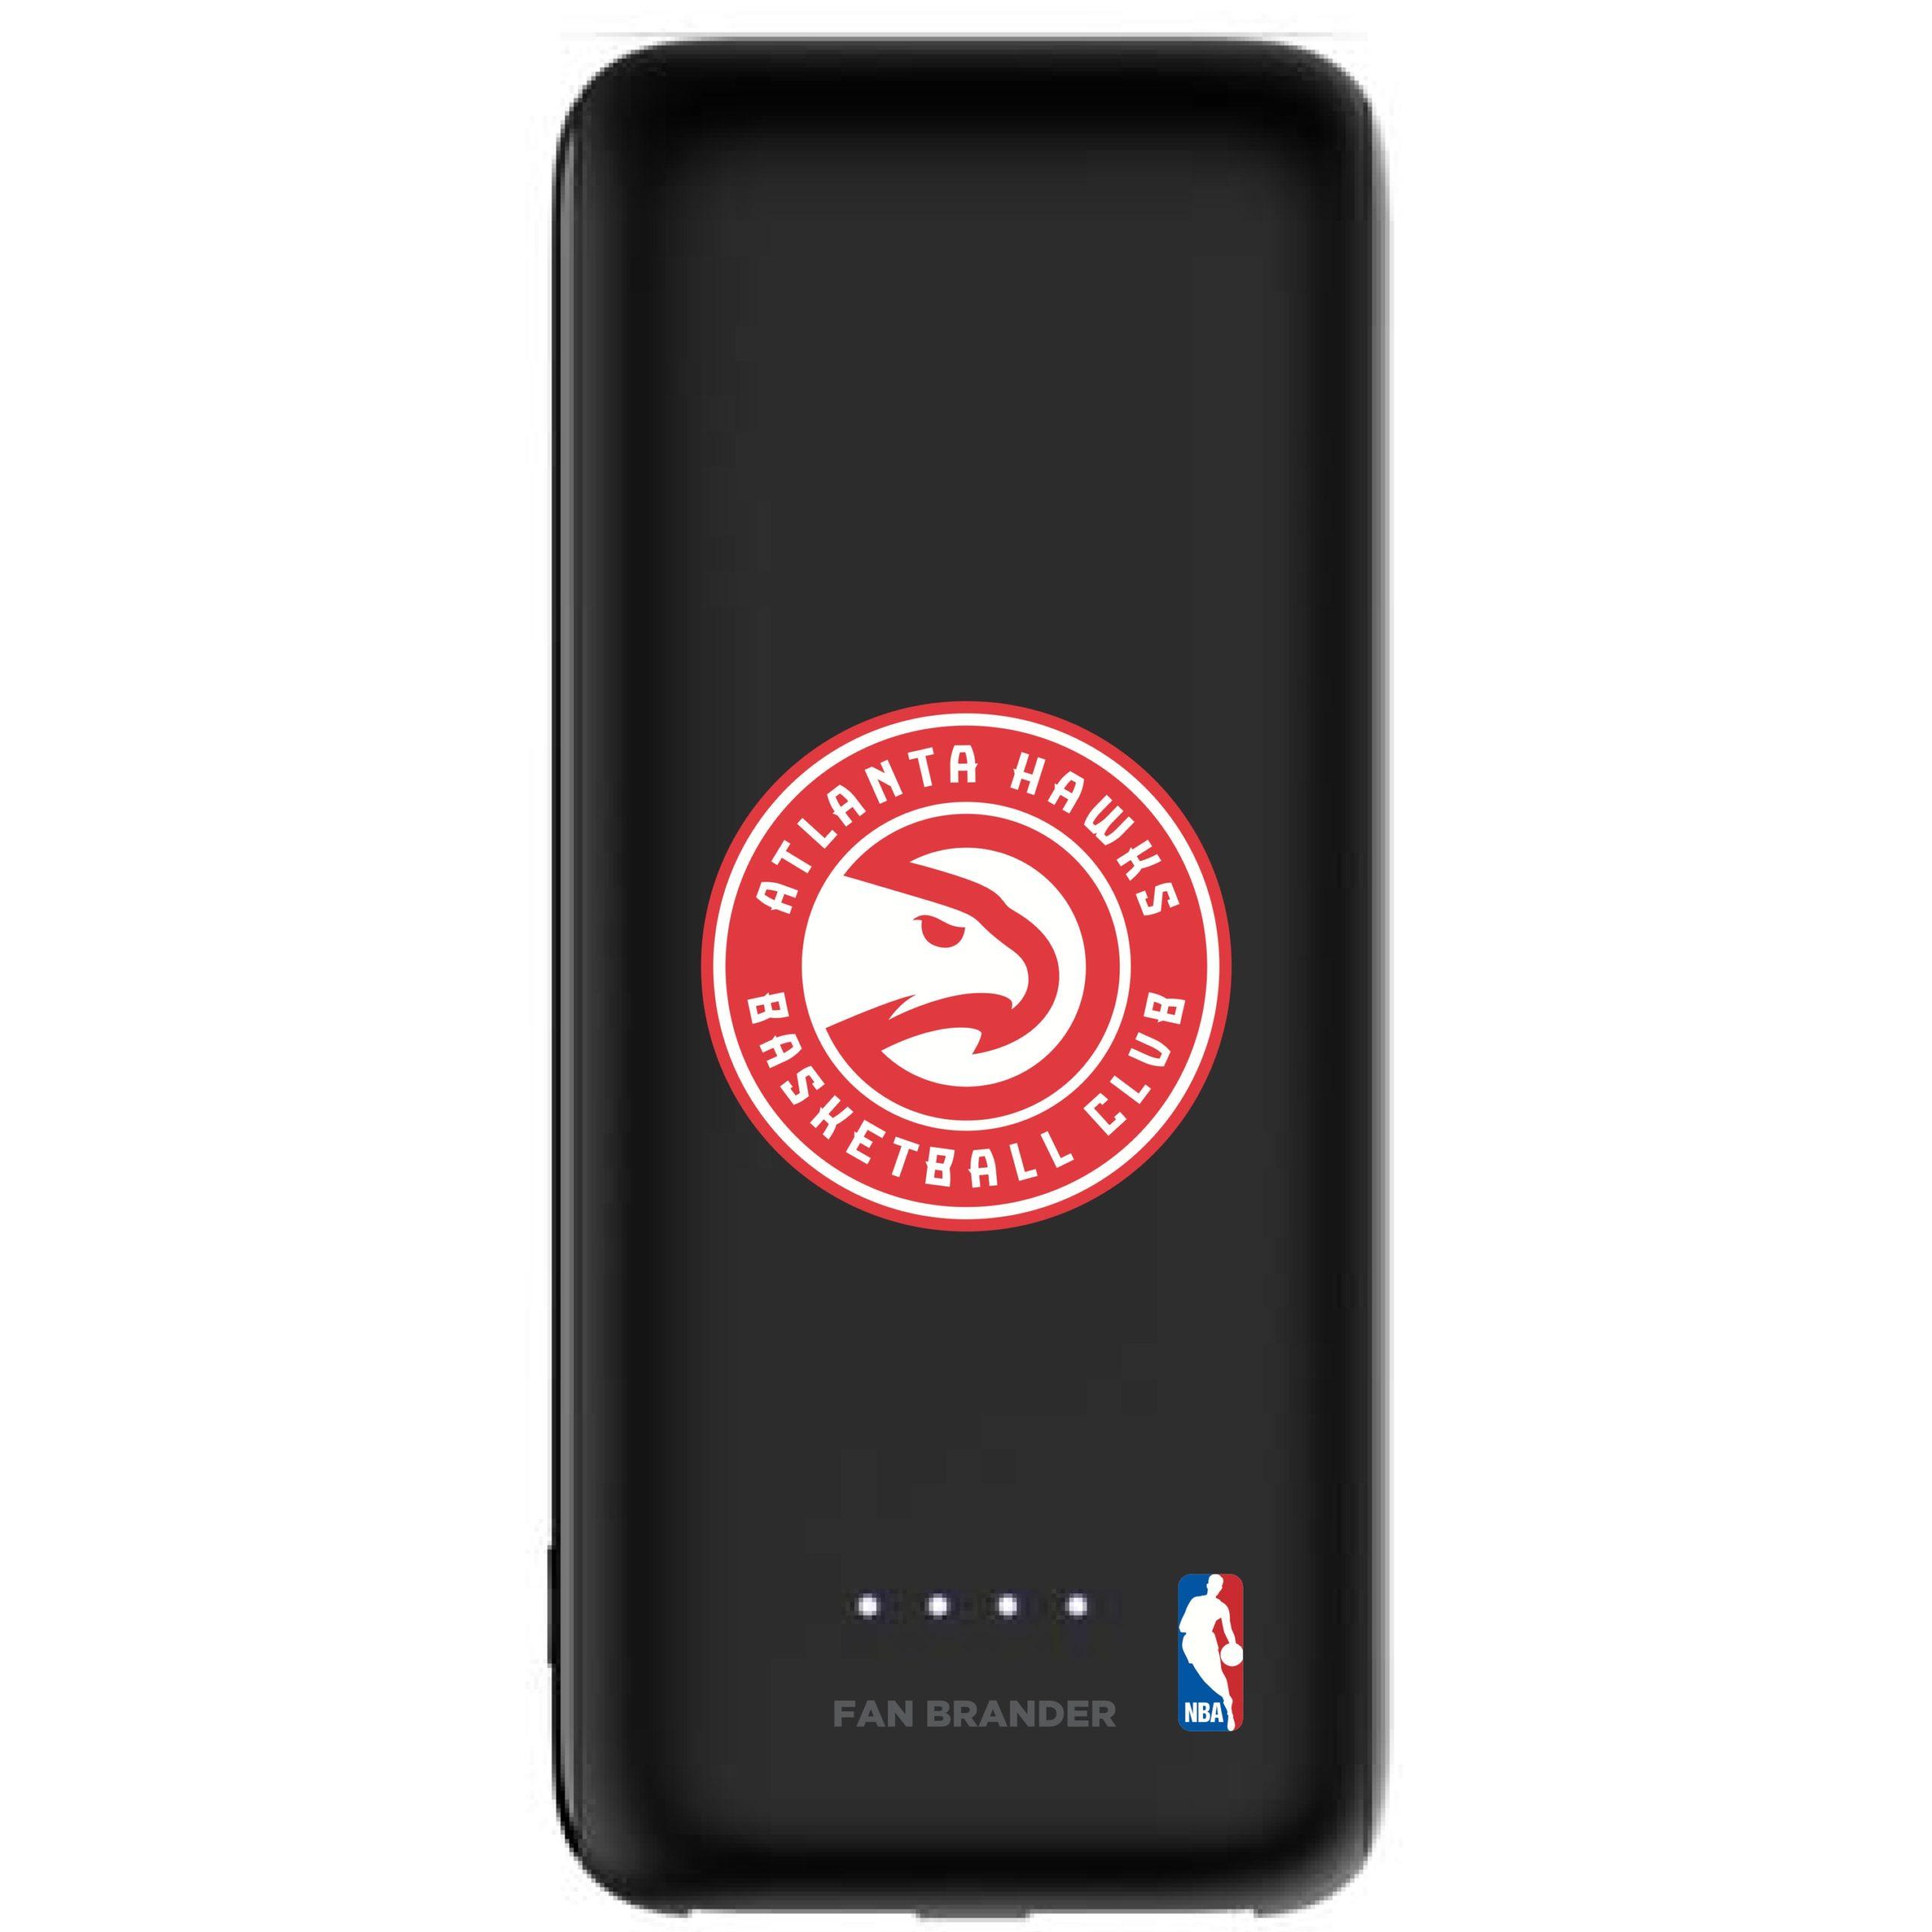 Atlanta Hawks mophie 5200 mAh Universal Battery Power Boost